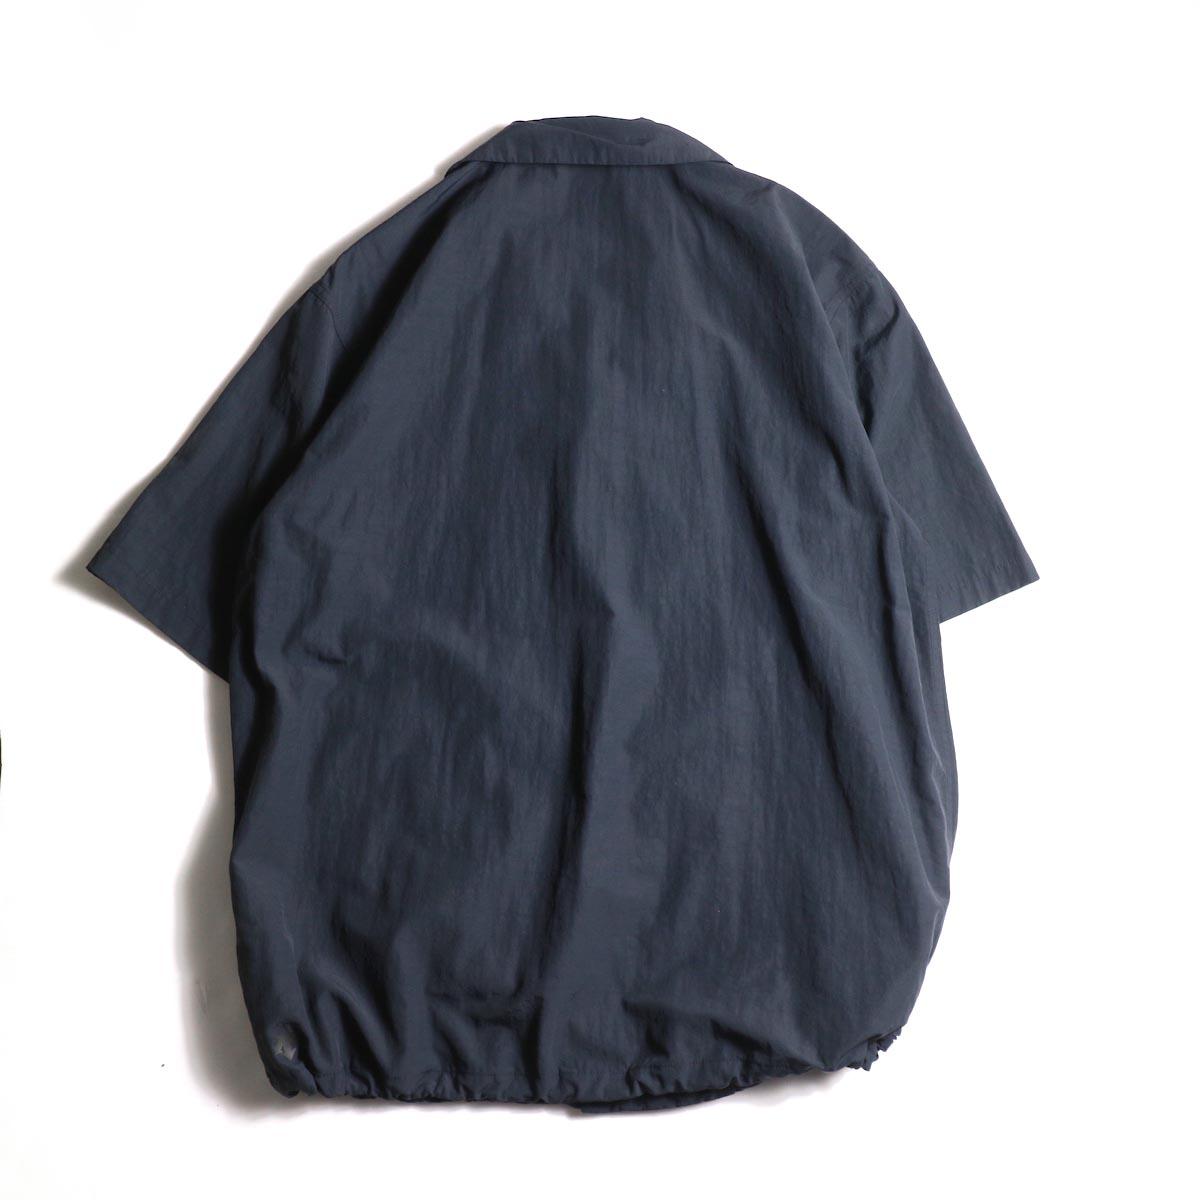 DESCENTE ddd / COACH SHIRT (Black)背面